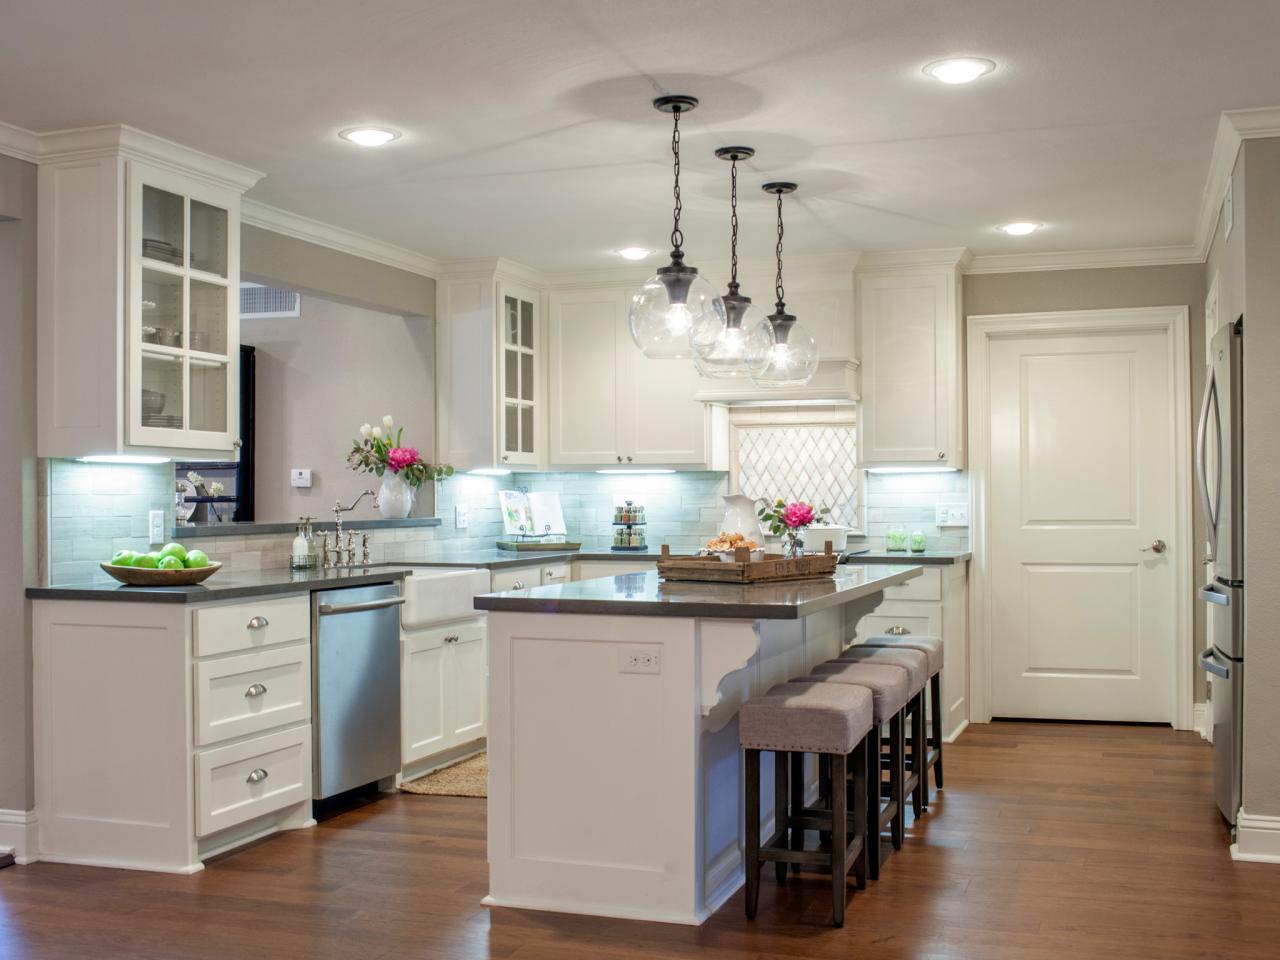 10 fixer upper modern farmhouse white kitchen ideas - kristen hewitt